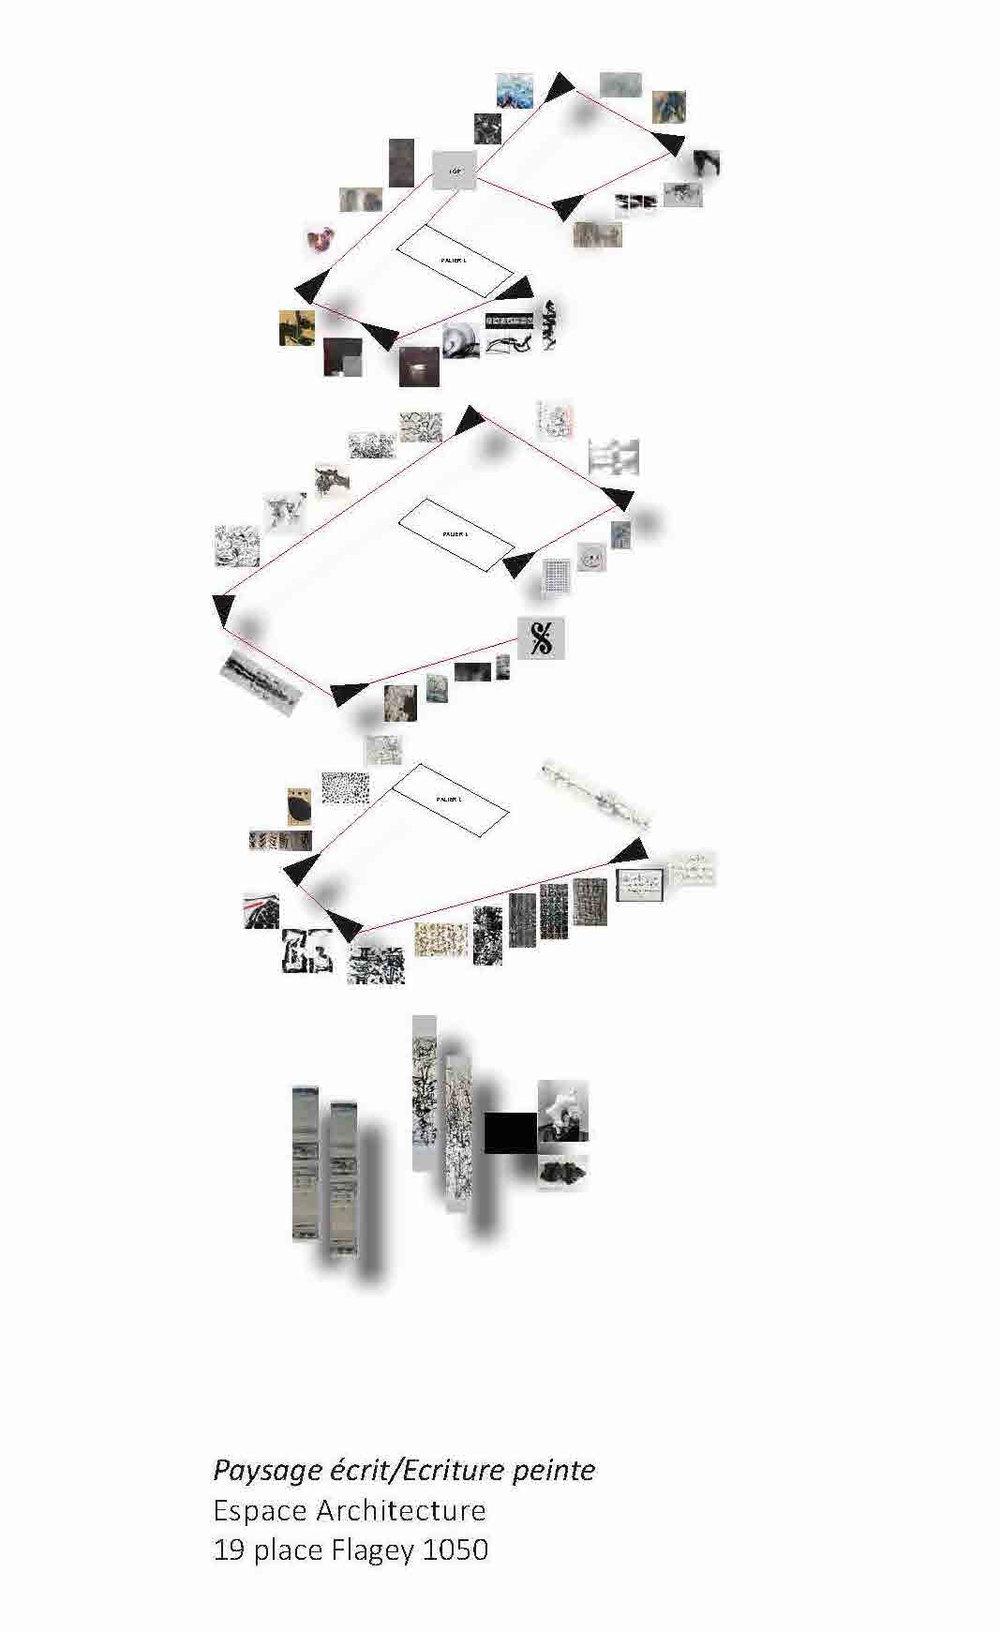 dépliant A4 INK BRUSSELS 2019_Page_1 copy.jpg